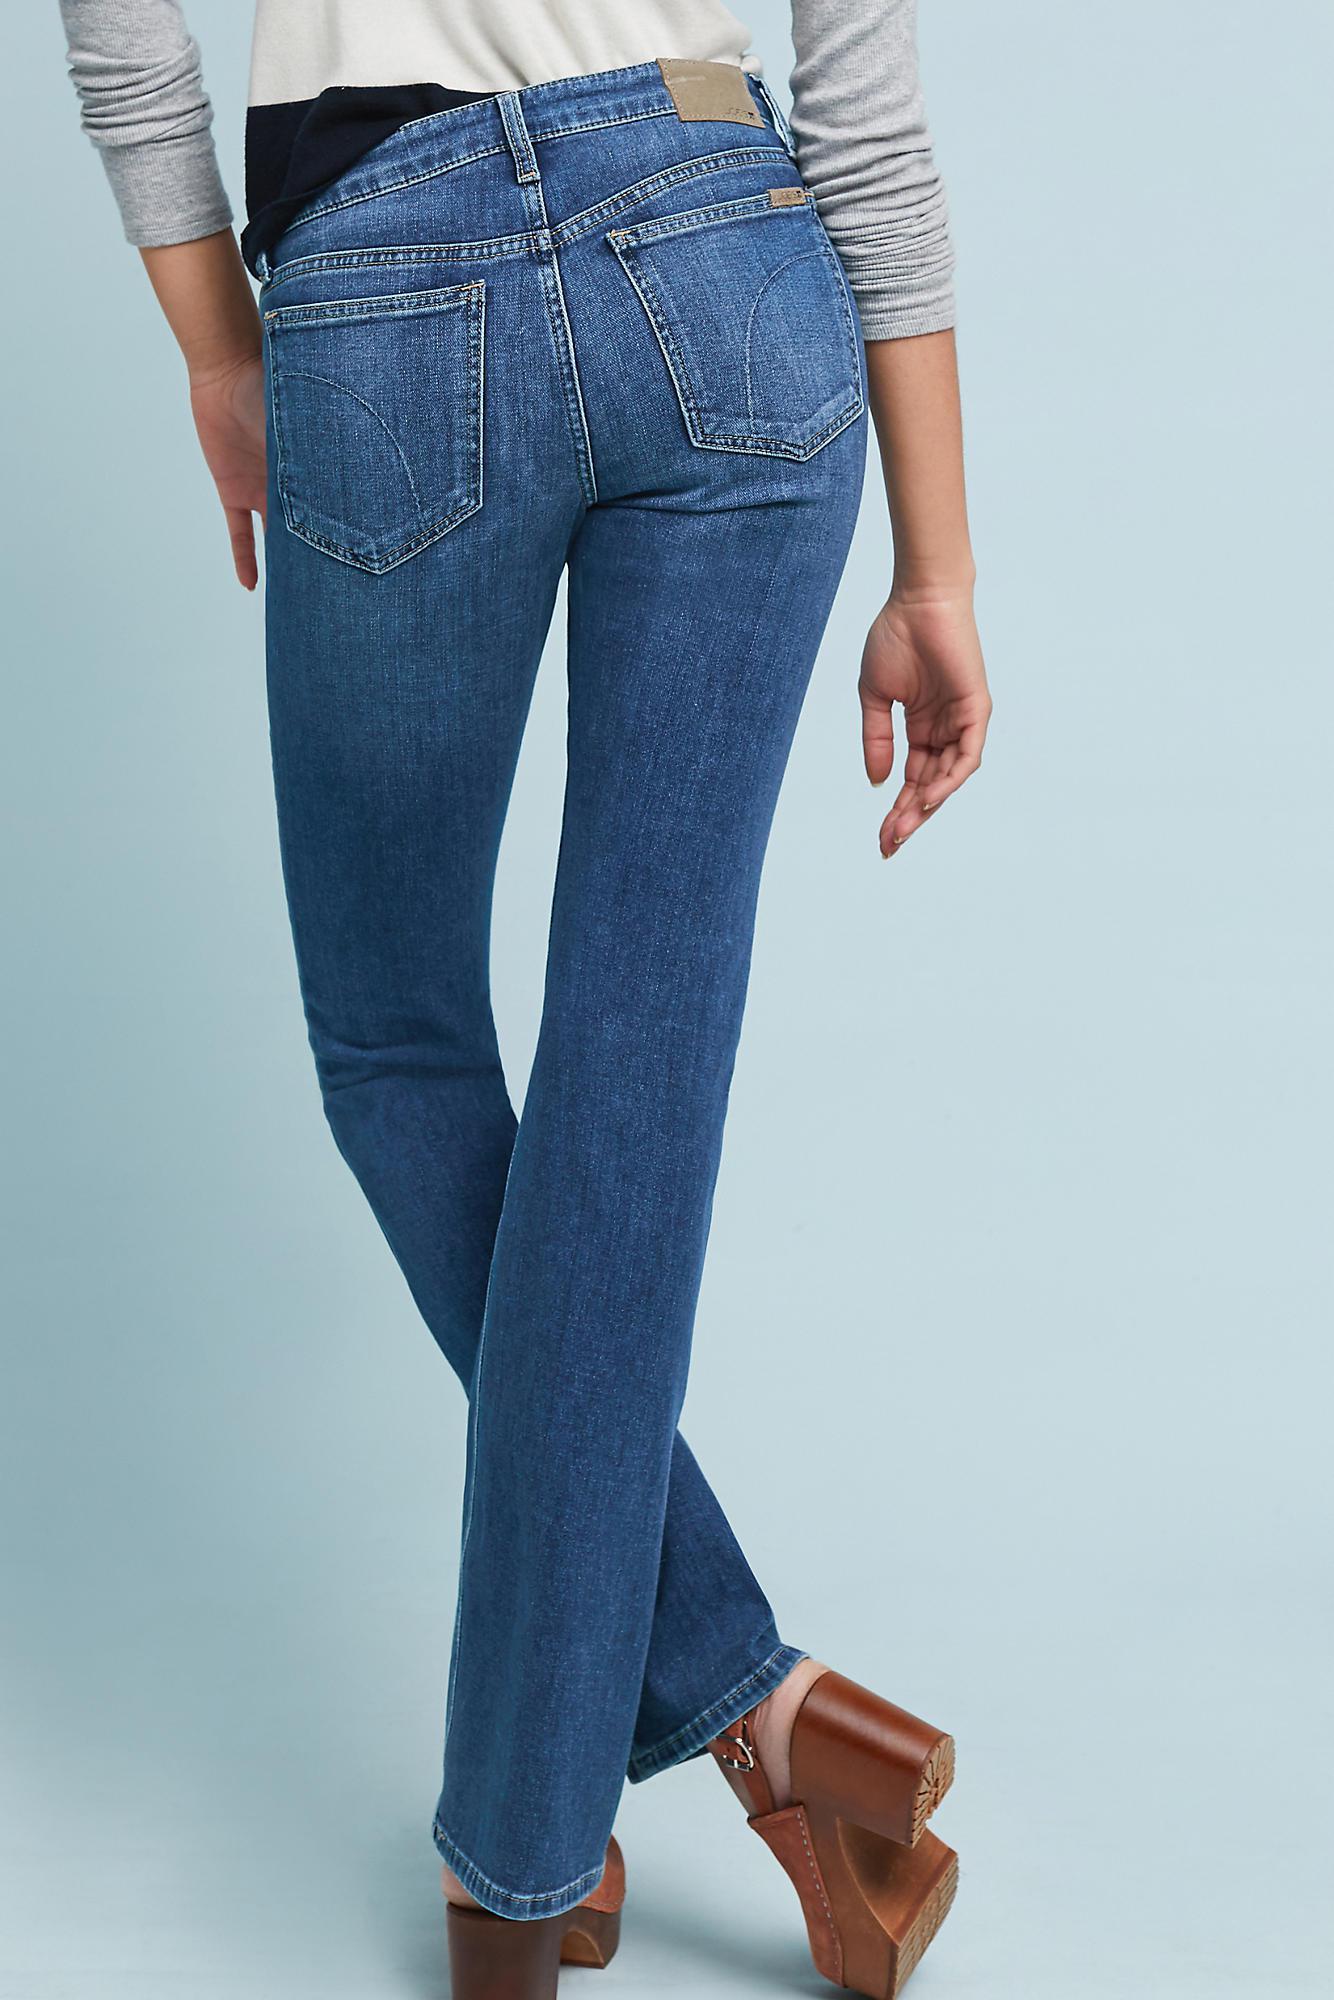 aaf91fb6176 ... Joe's Honey Mid-rise Curvy Bootcut Jeans | Lyst. View Fullscreen